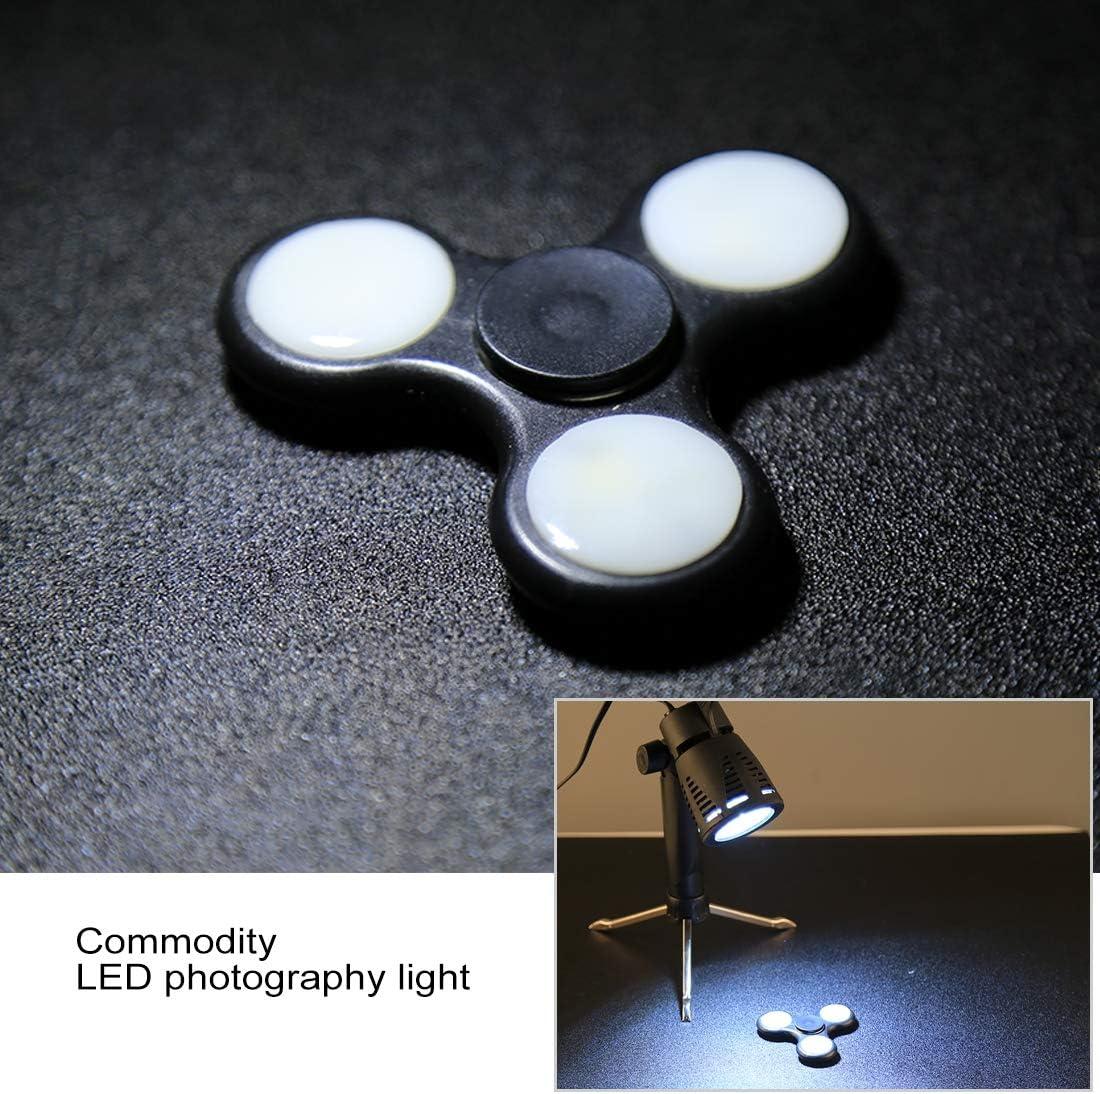 White Light Color : White Light HUANGMENG HUANGMENG Photographic Lighting 6W 12 SMD 5730 LED Photography Photo Studio Portable Handheld Light Lamp